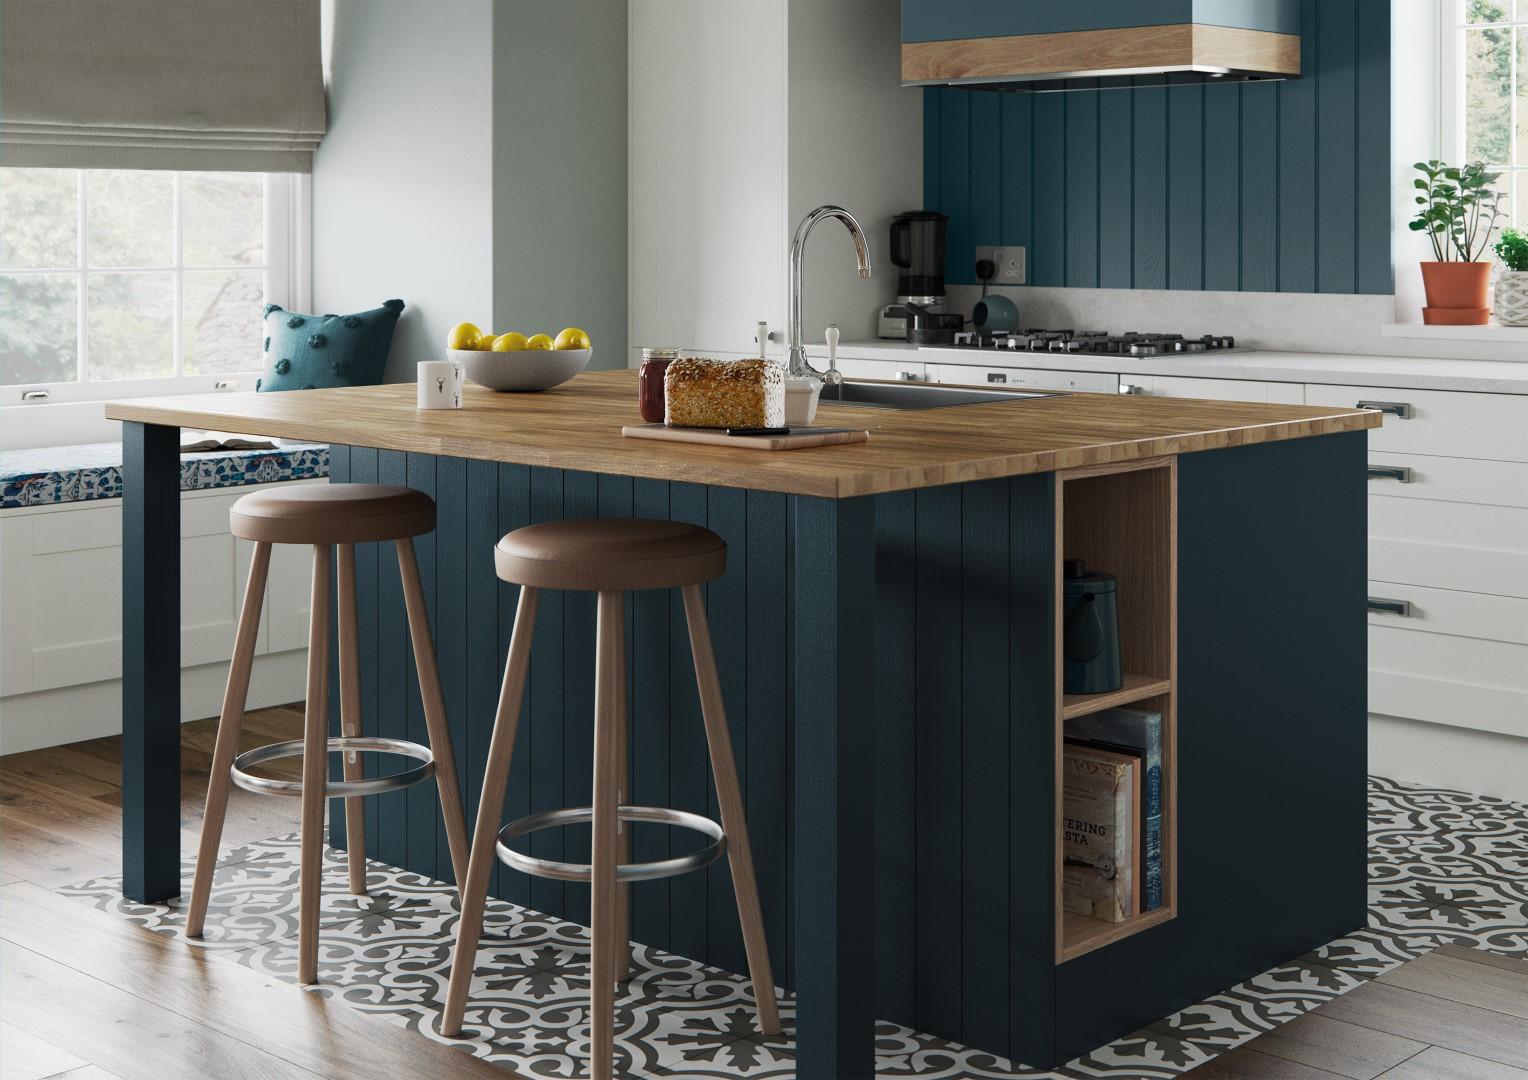 Madison Porcelain and Marine - Kitchen Design - Alan Kelly Kitchens - Waterford - 4